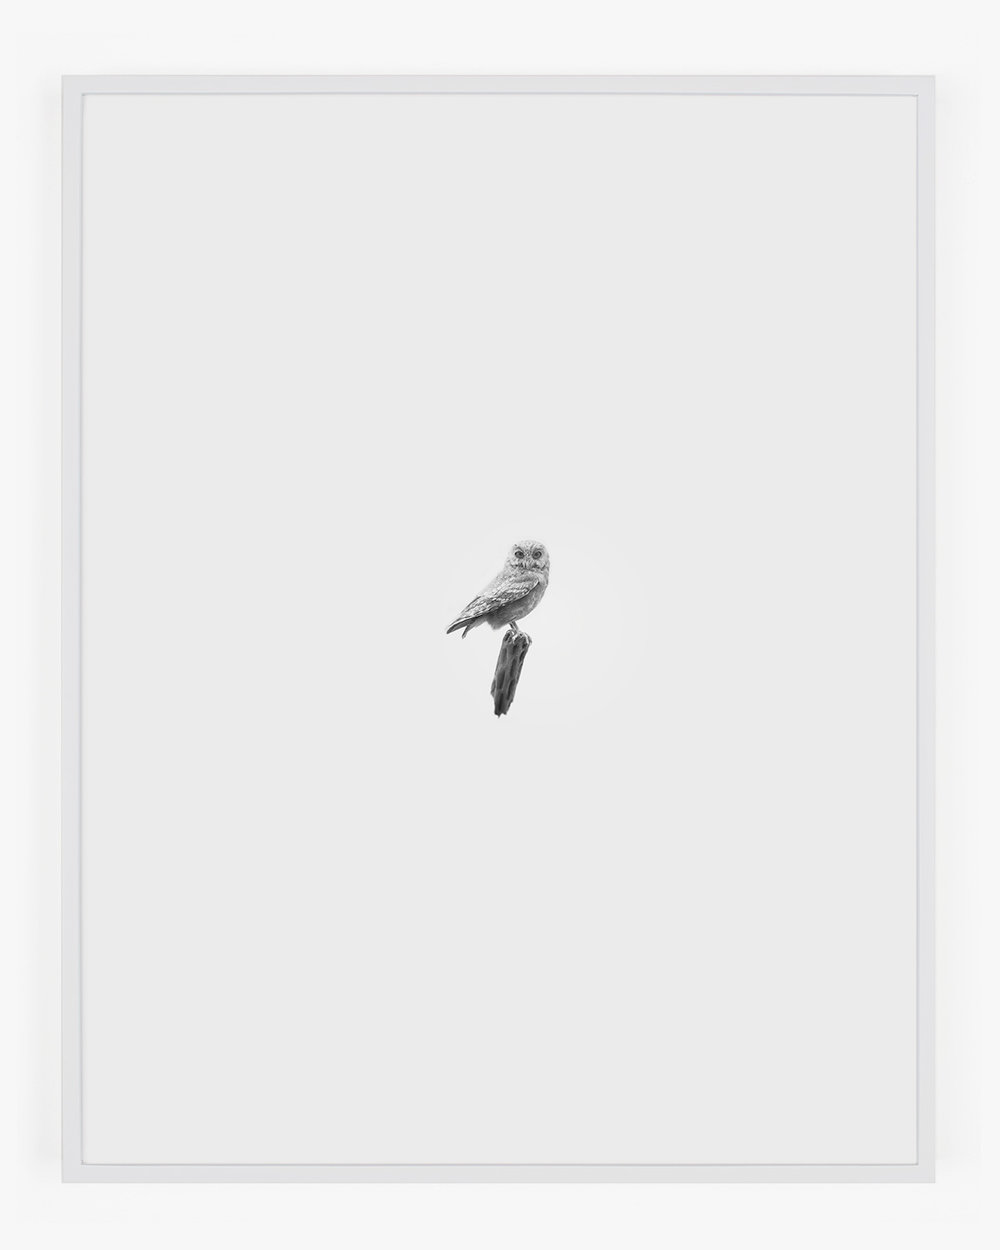 1862_Elf_Owl_Handal_Web.jpg